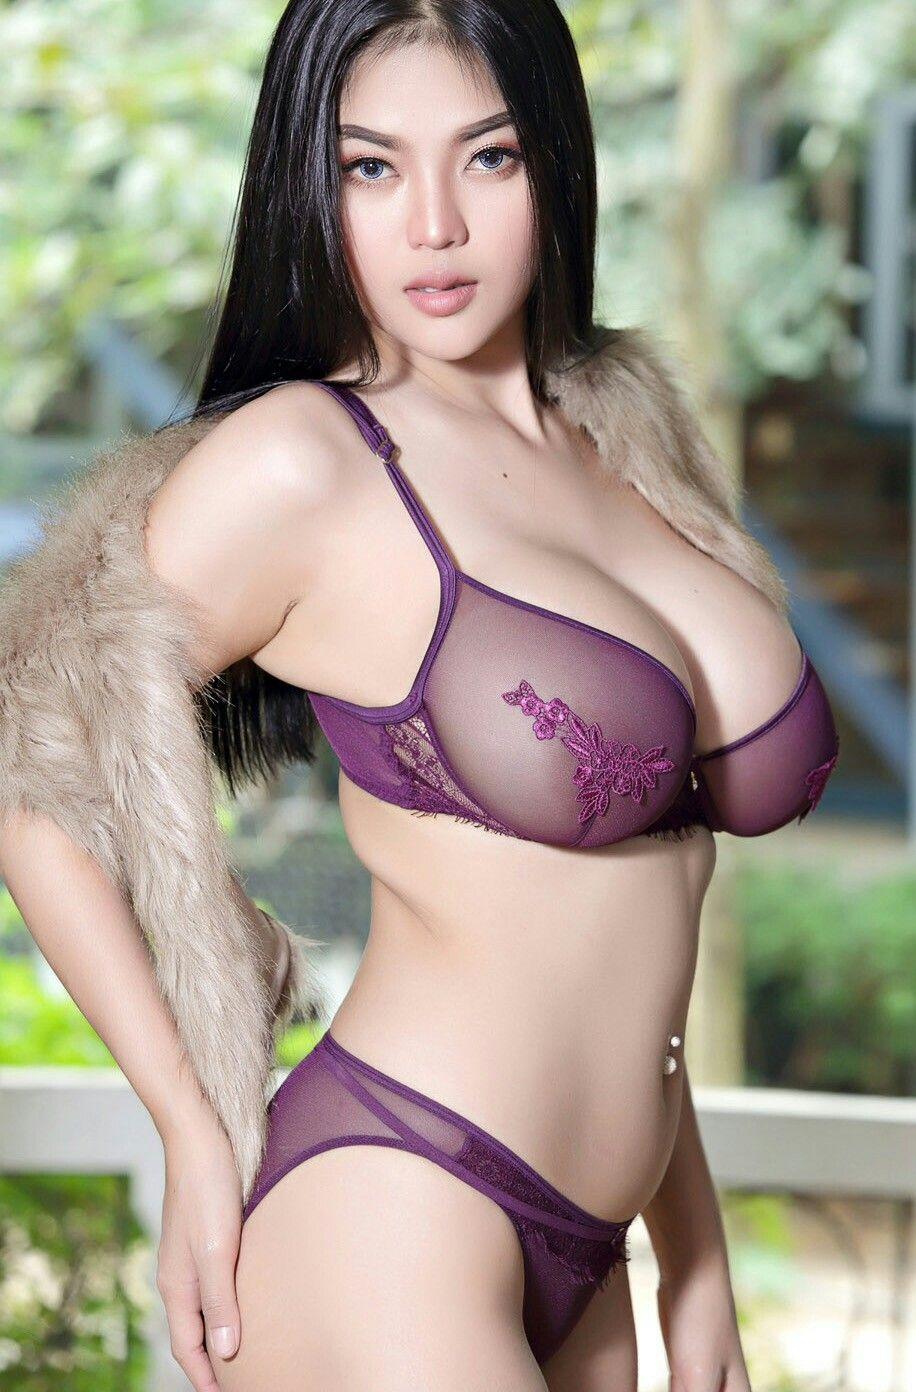 Busty asian models